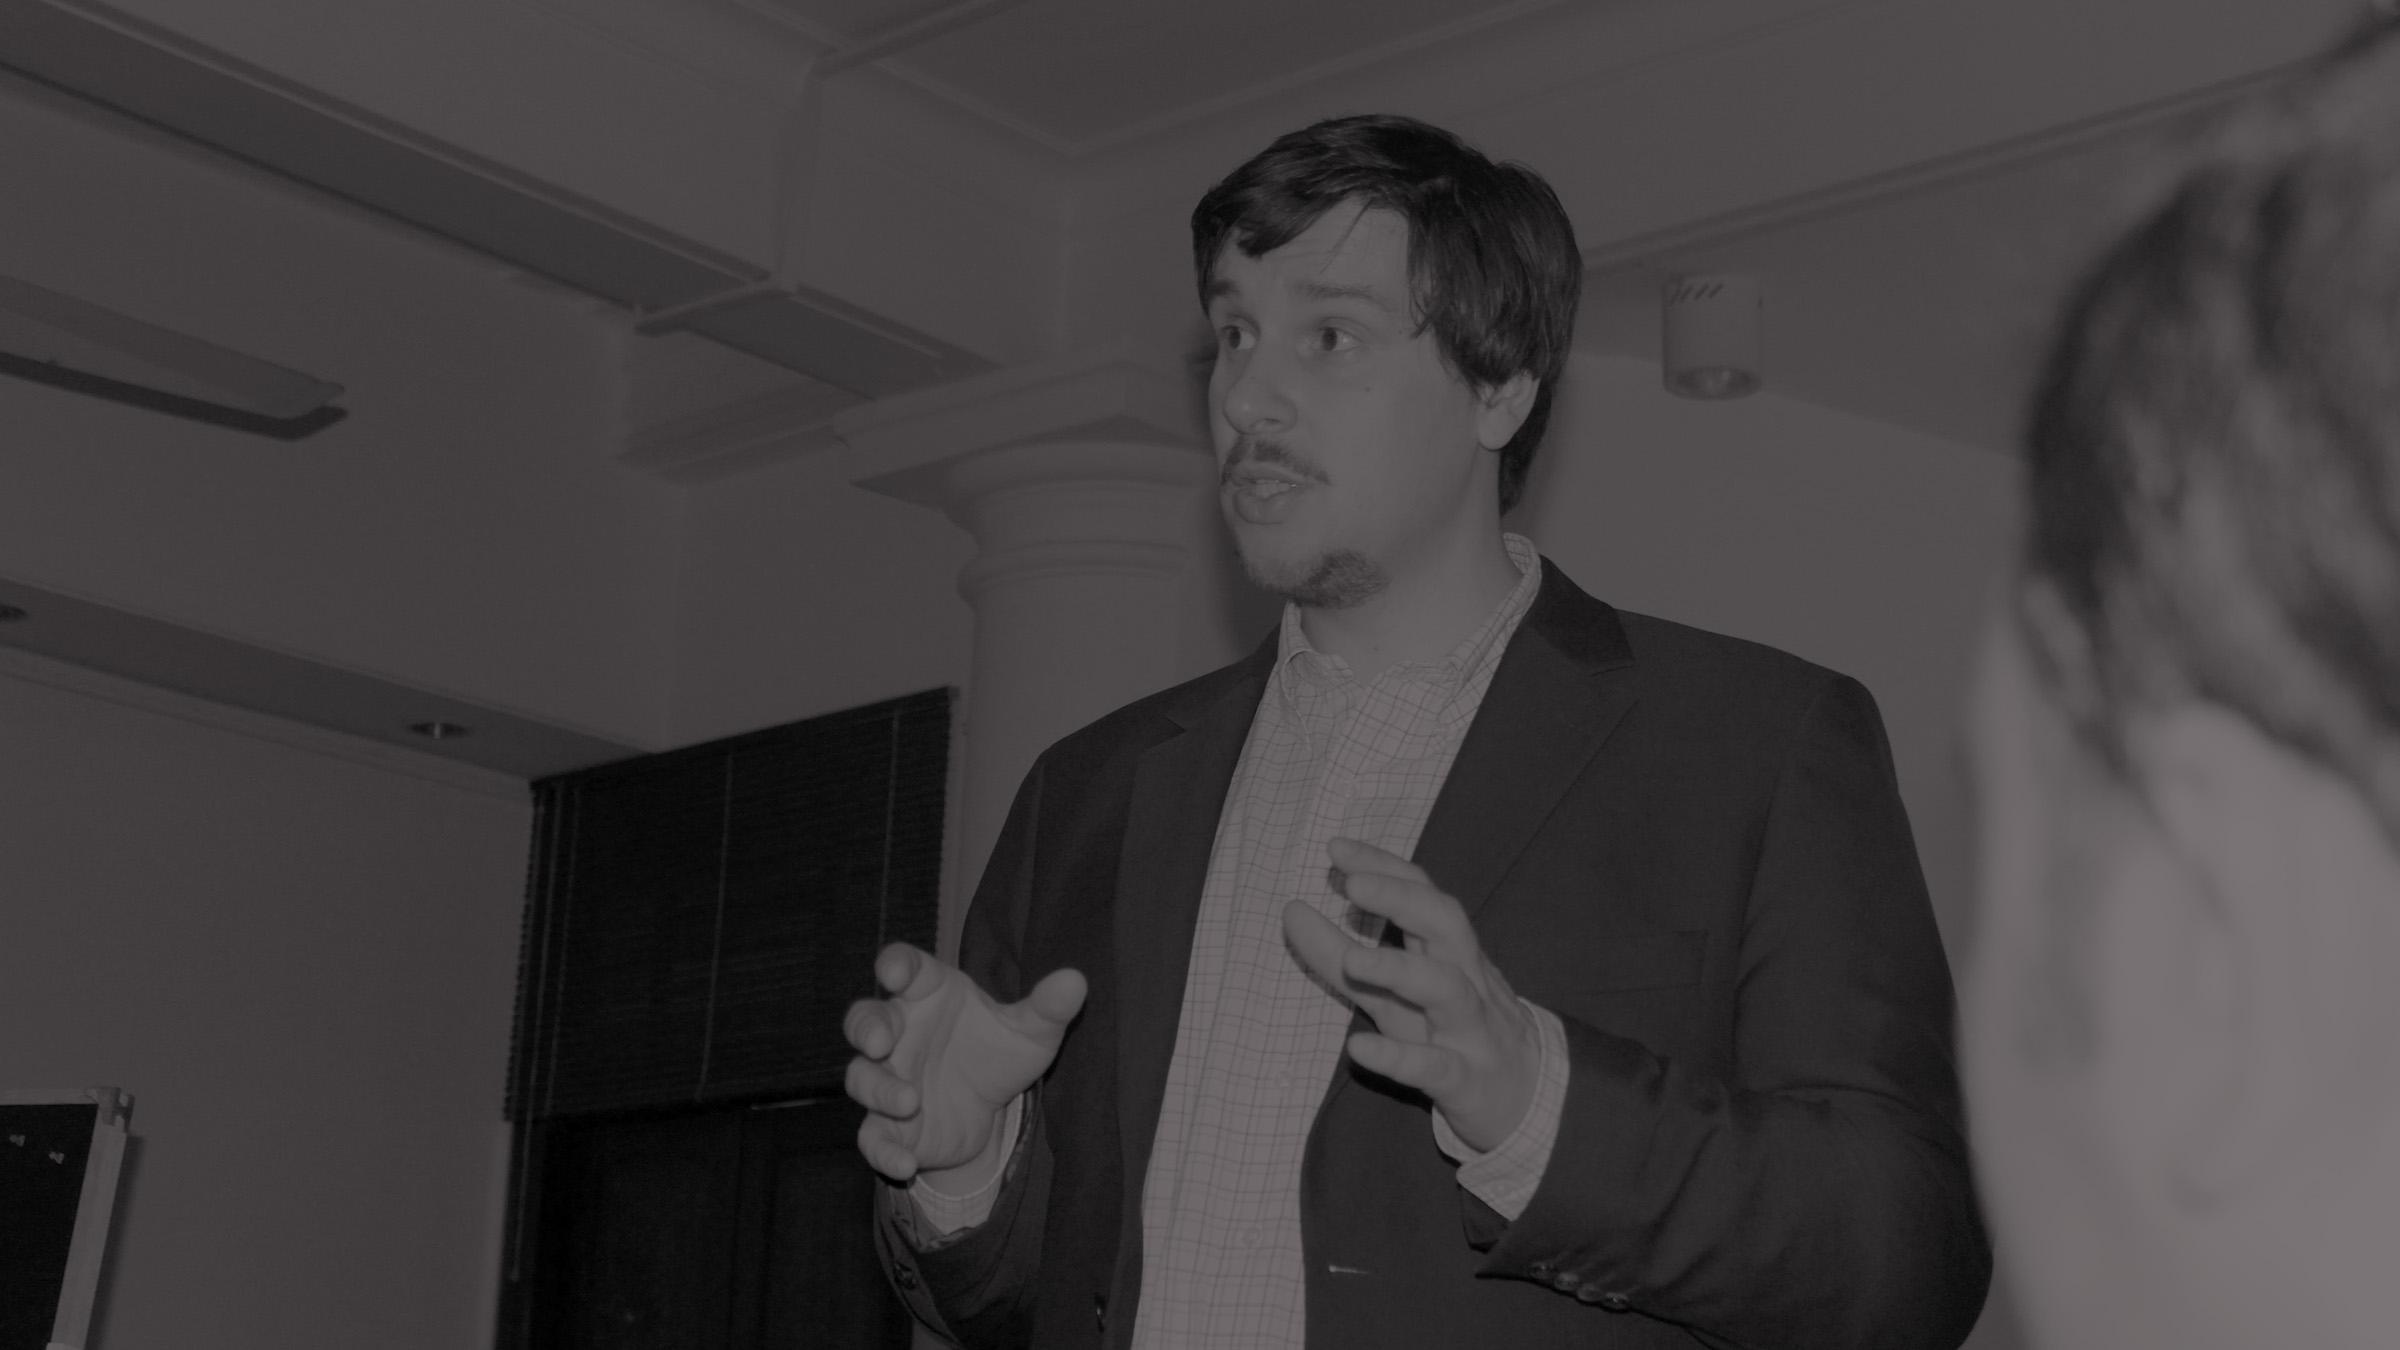 Dr. Patrick S. Föhl